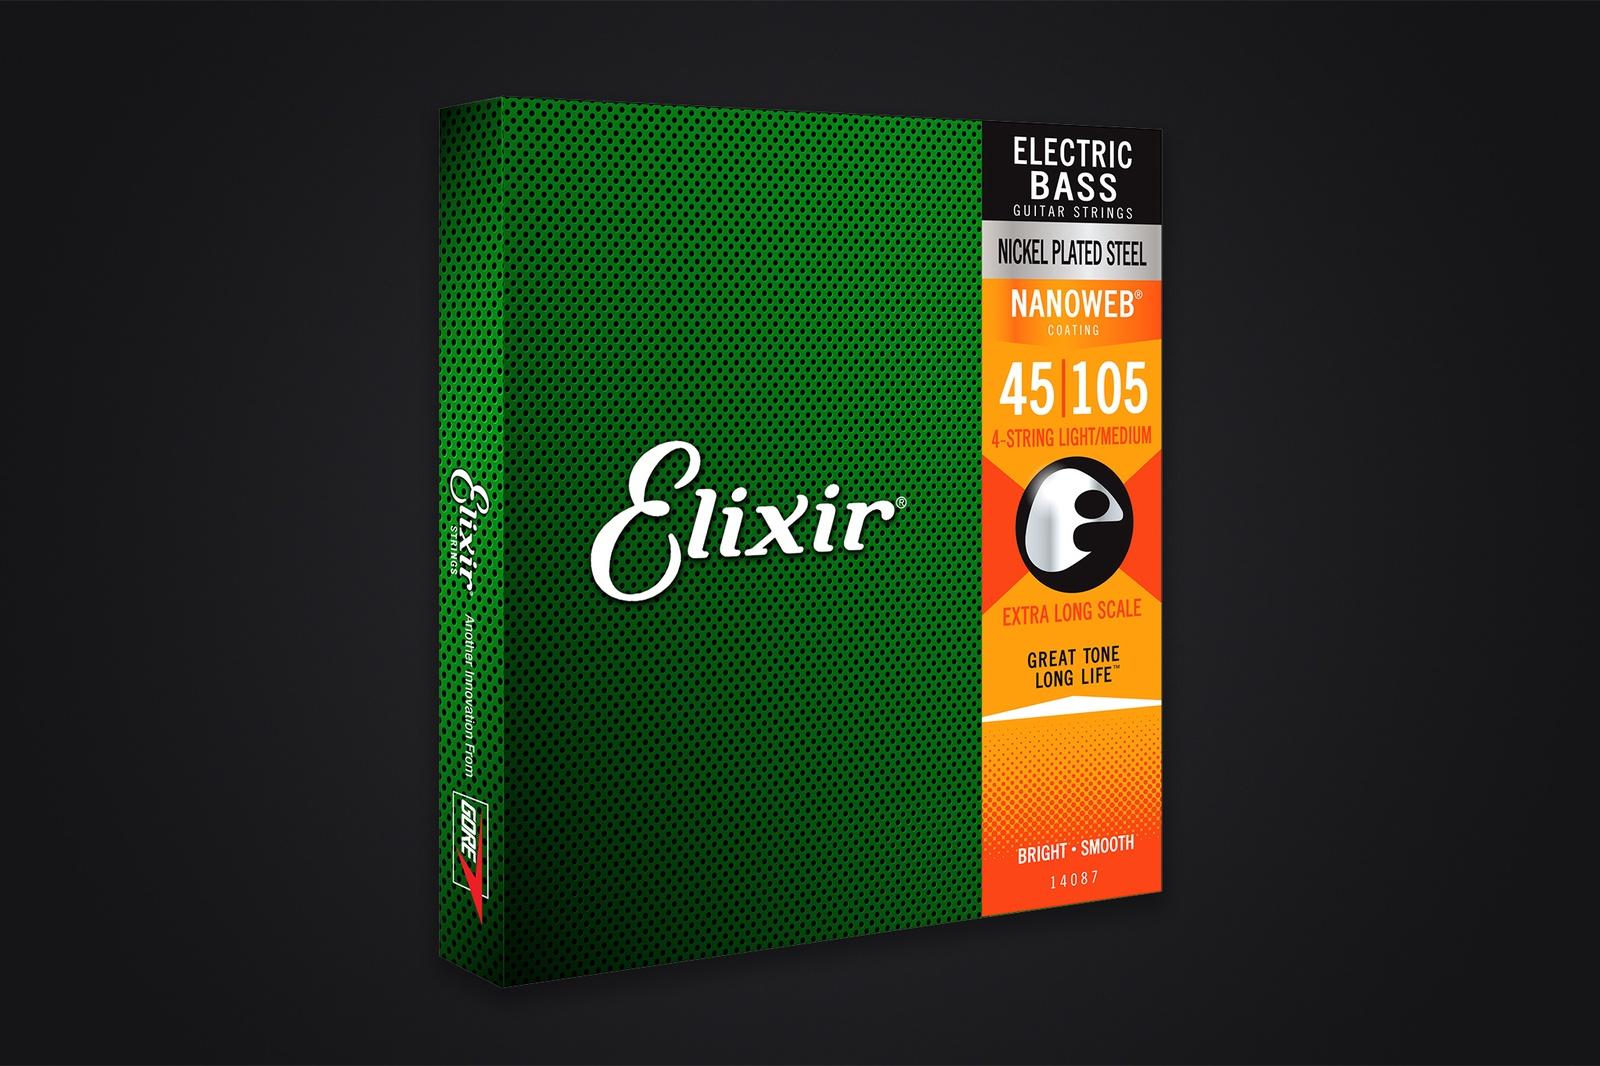 Струны для гитары Elixir Strings 14087 elixir 14087